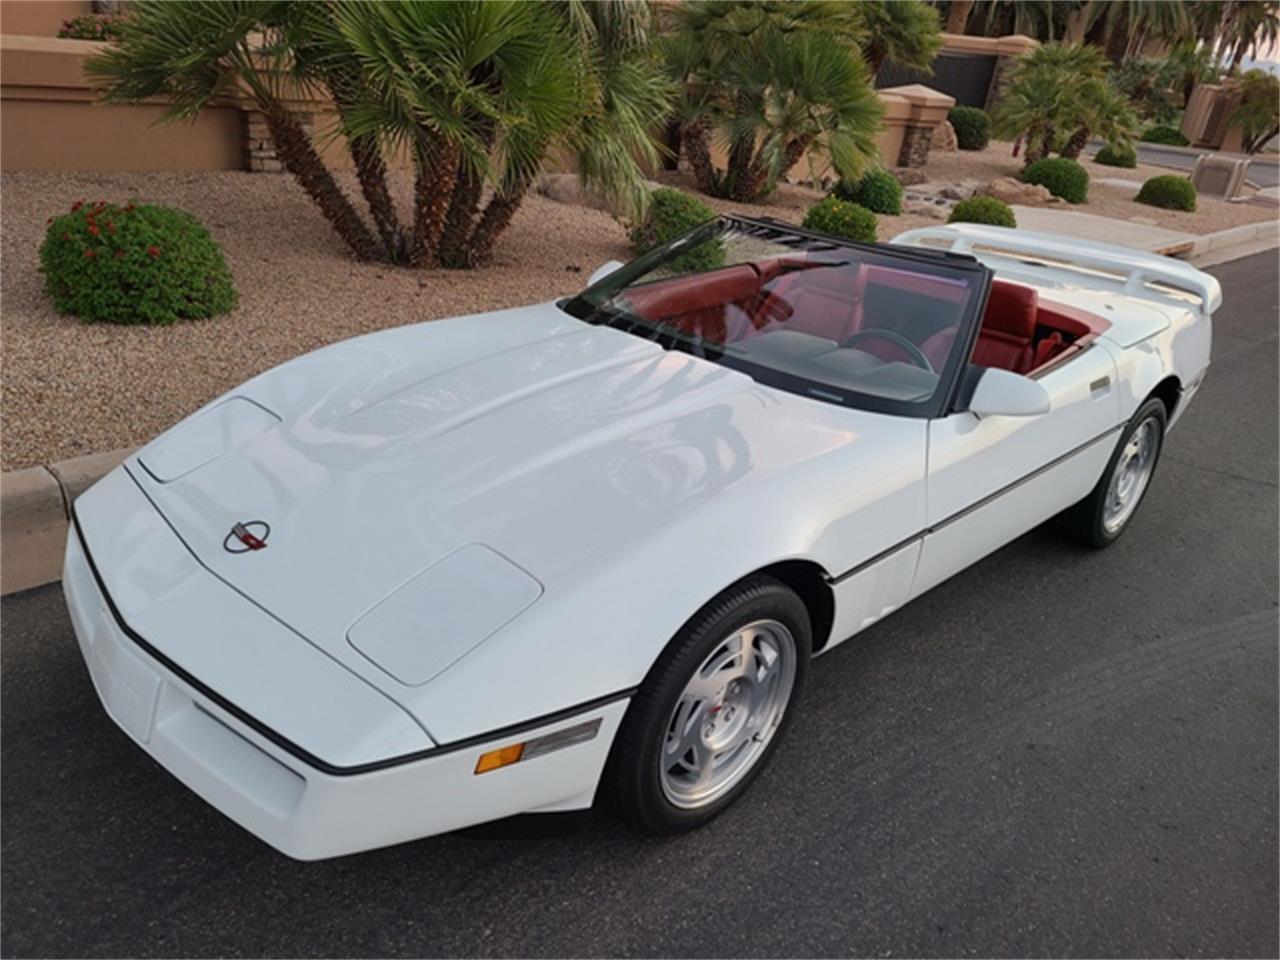 1990 Chevrolet Corvette (CC-1414027) for sale in Palm Springs, California